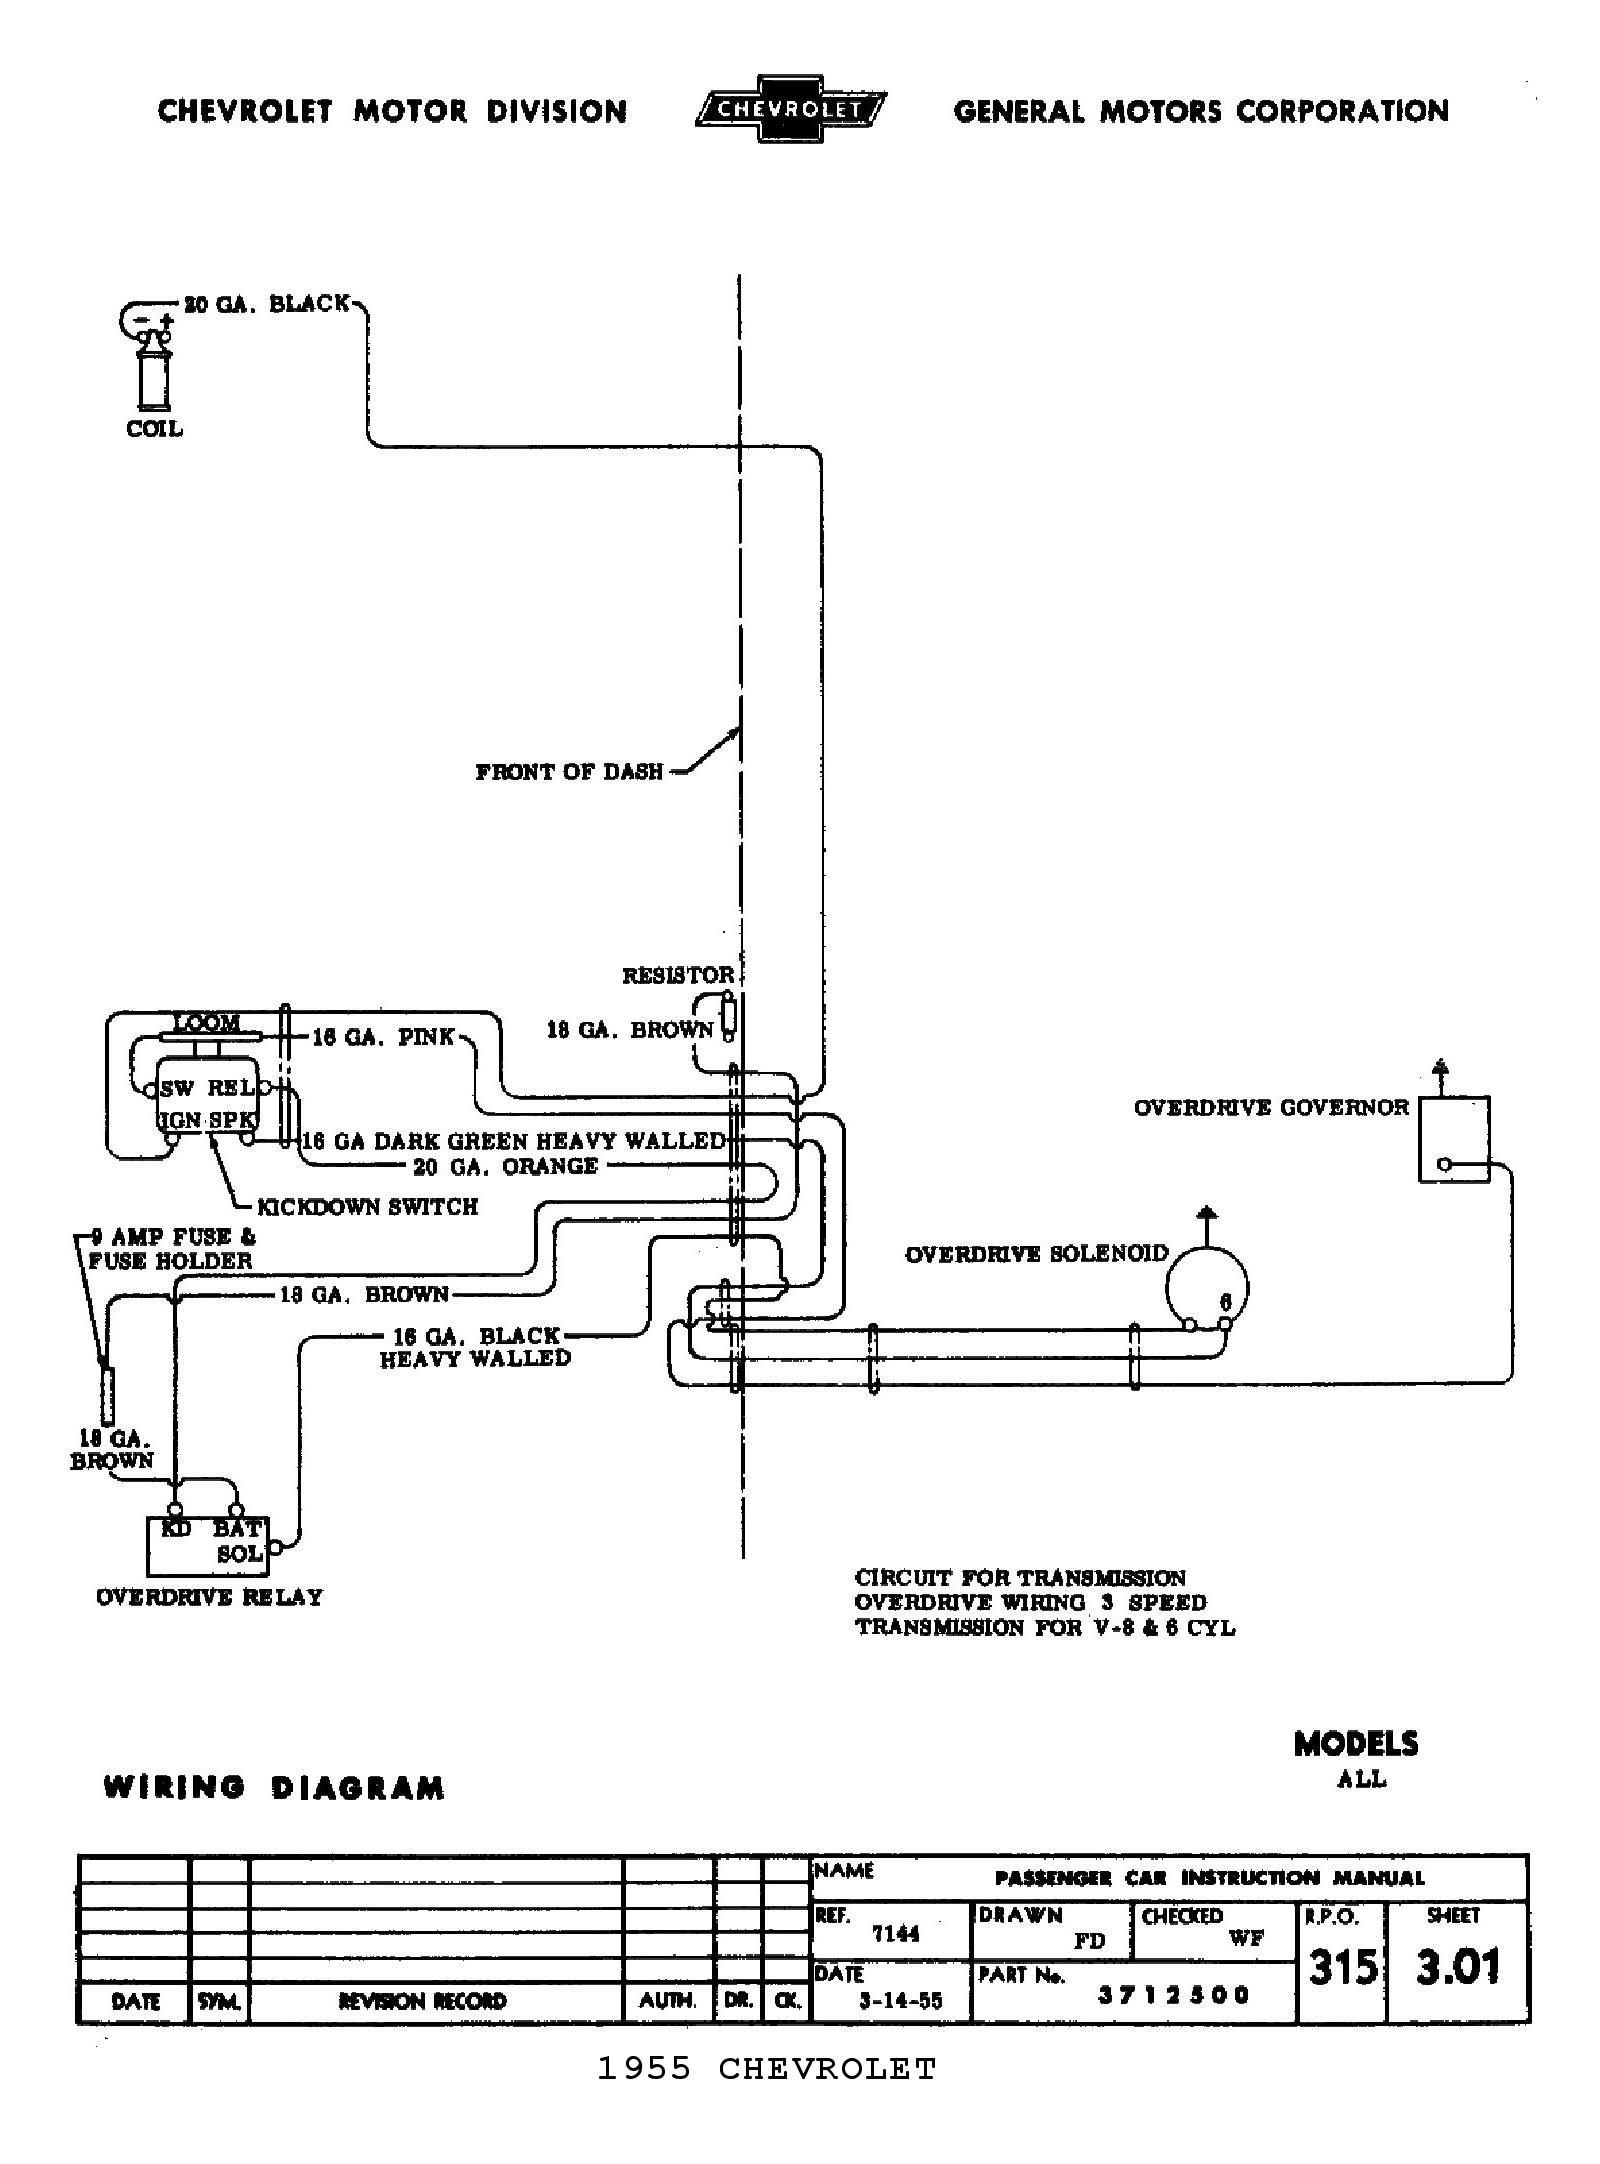 1989 Chevy Wiring Diagram 1955 Truck Image 1500 5 Speed